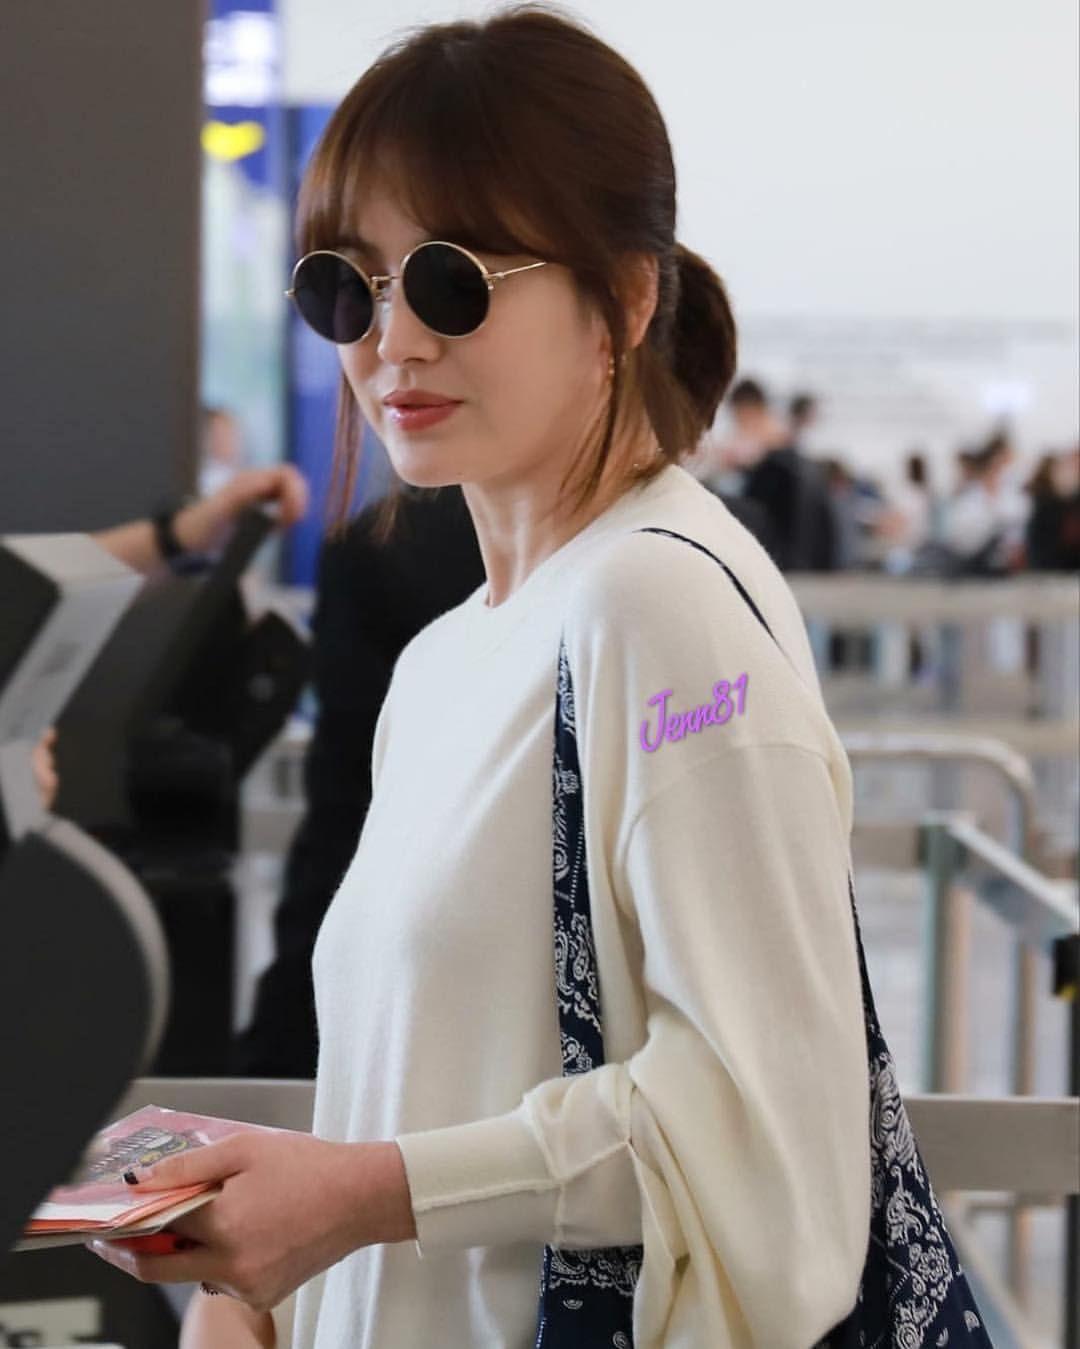 pin by memon shifa on song hye kyo in 2019 | song hye kyo